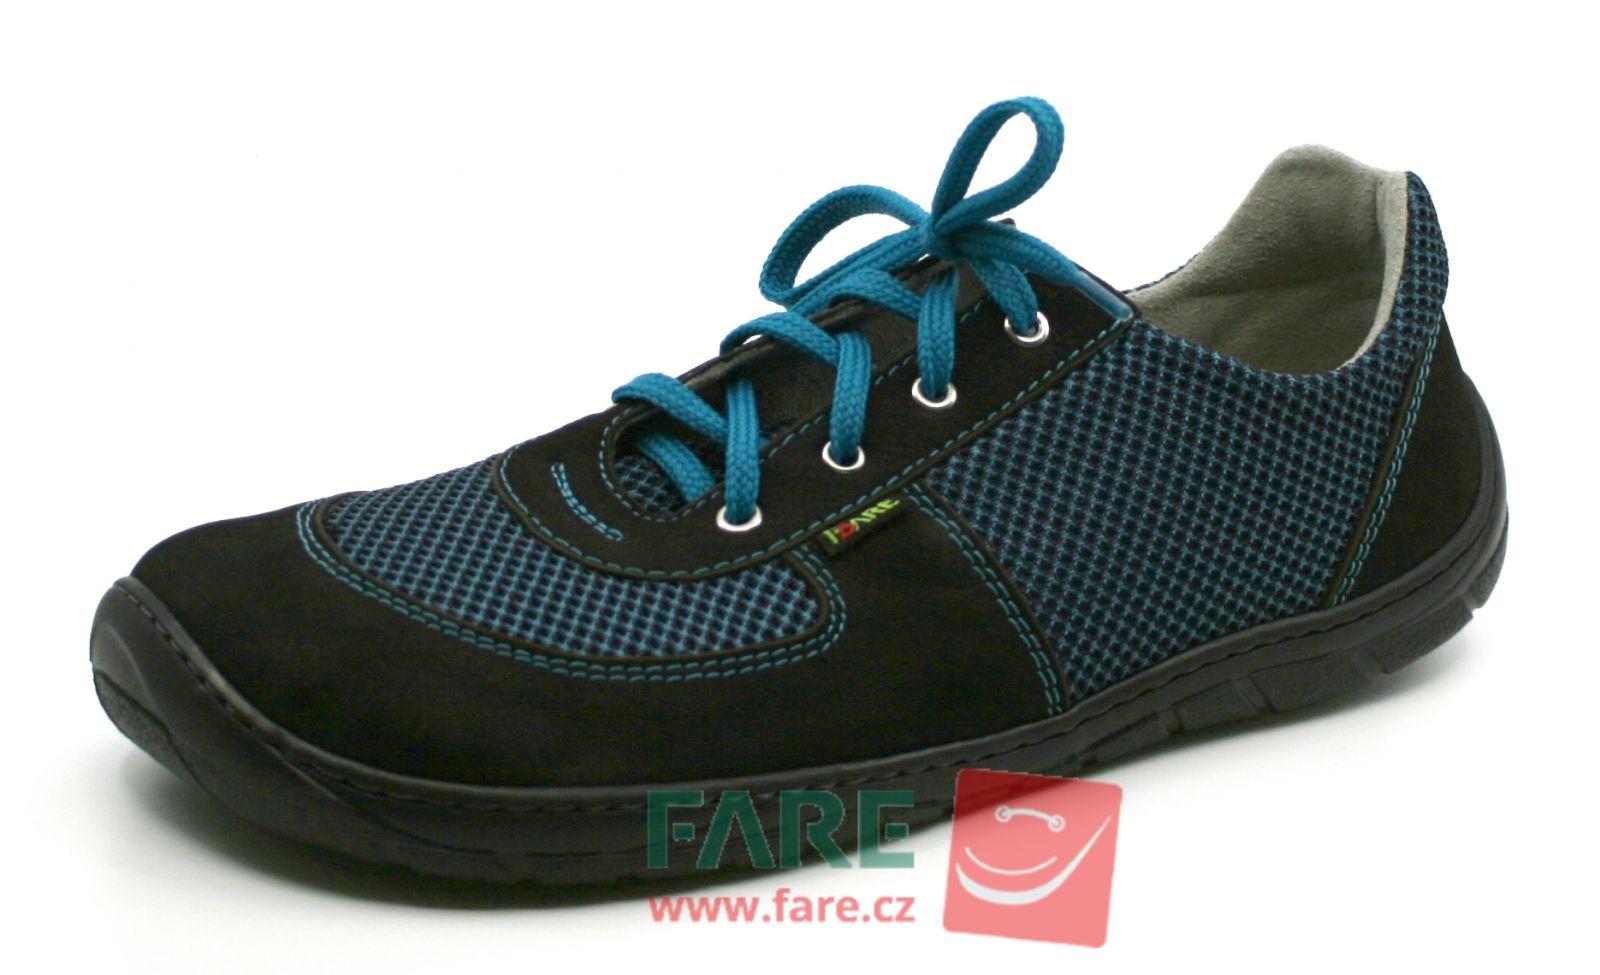 Barefoot FARE BARE UNISEX BAREFOOT TENISKY B5713202 bosá